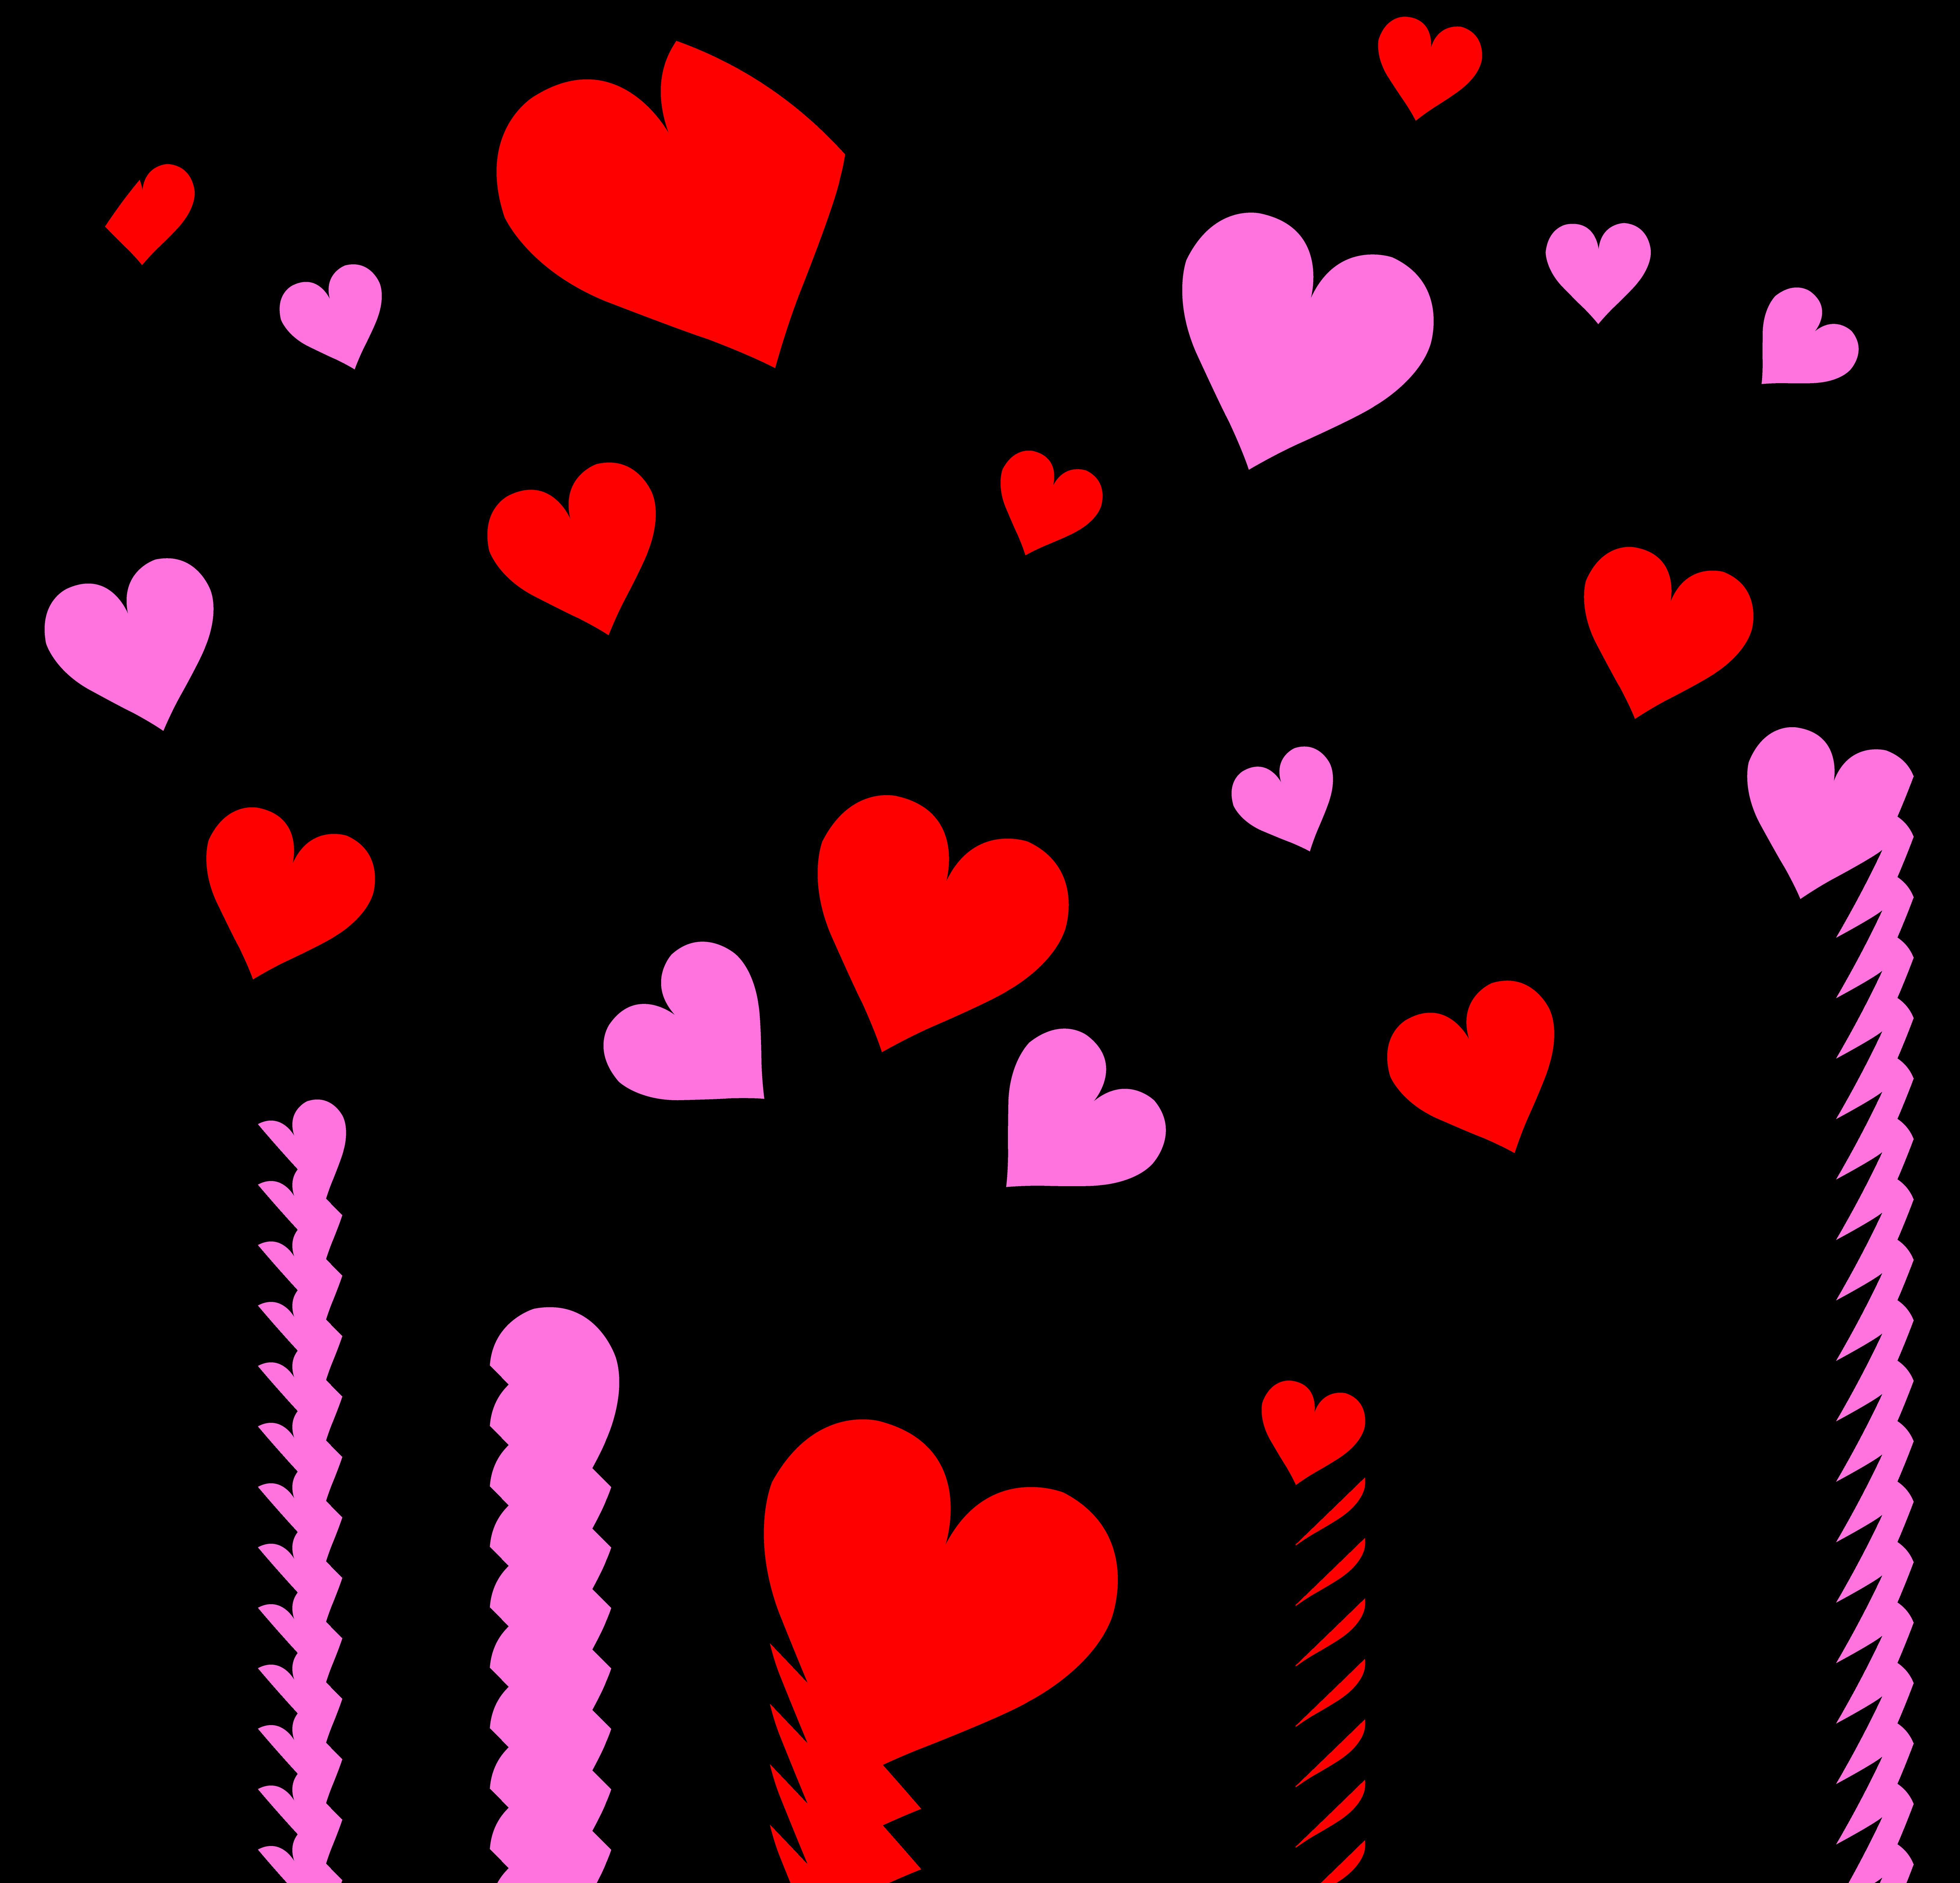 Clipart Love Heart.